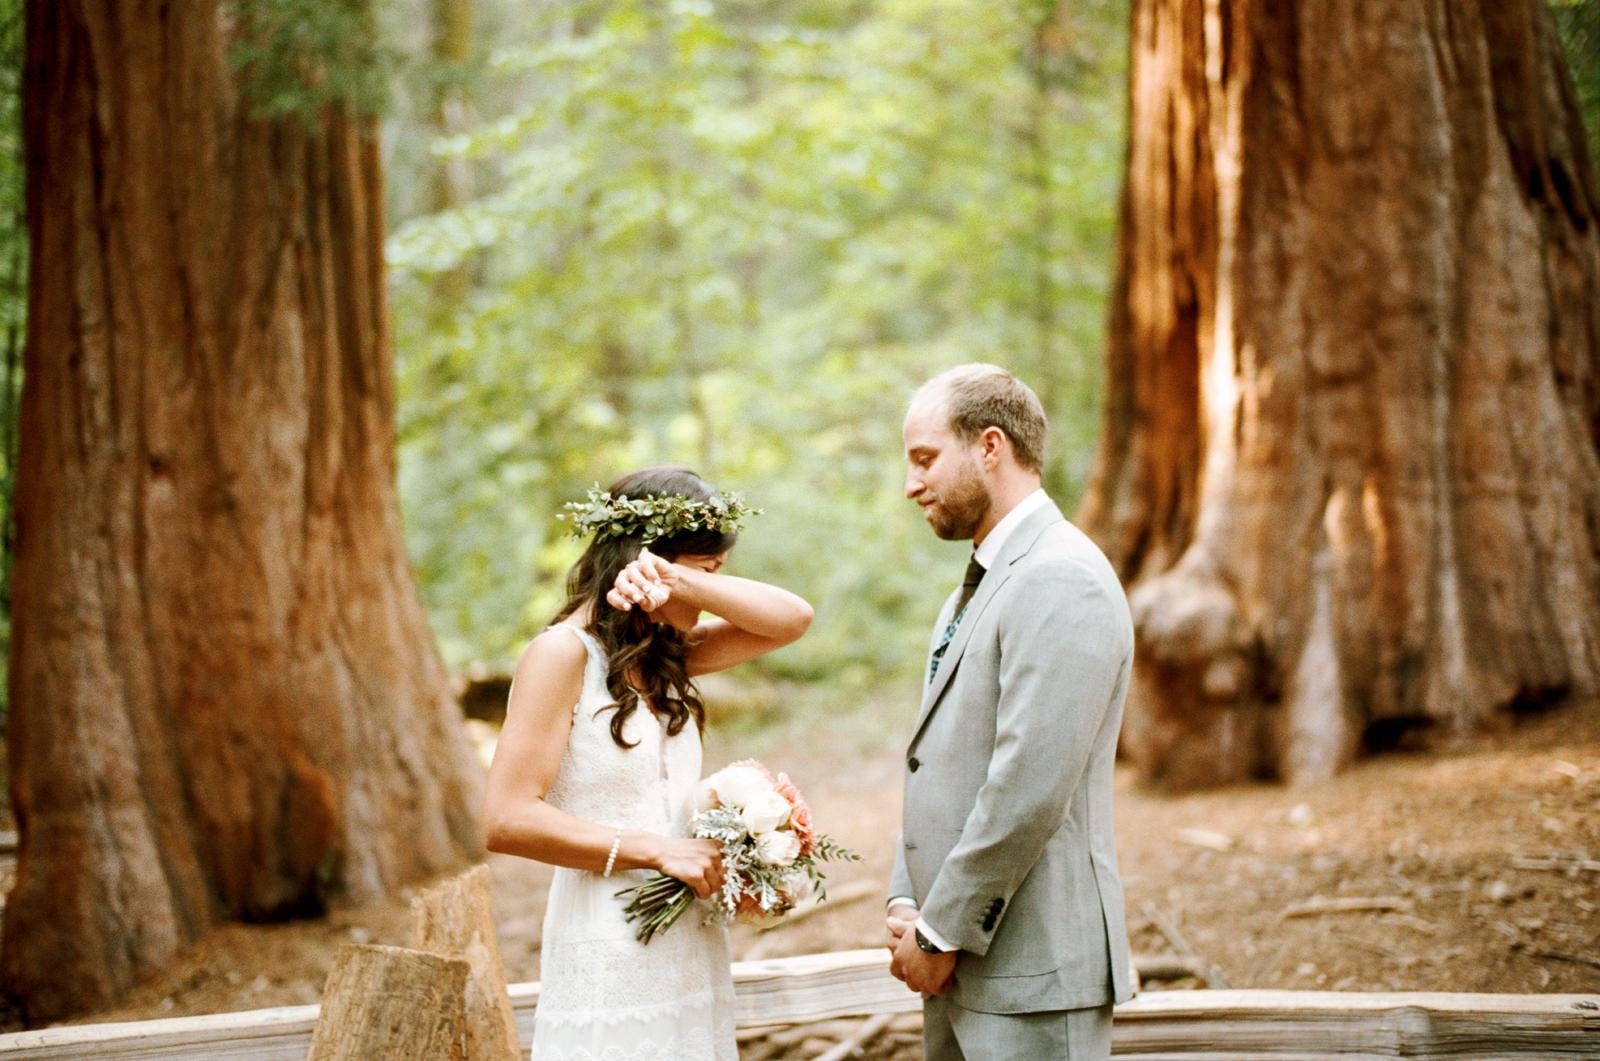 yosemite-intimate-wedding-051 YOSEMITE INTIMATE WEDDING